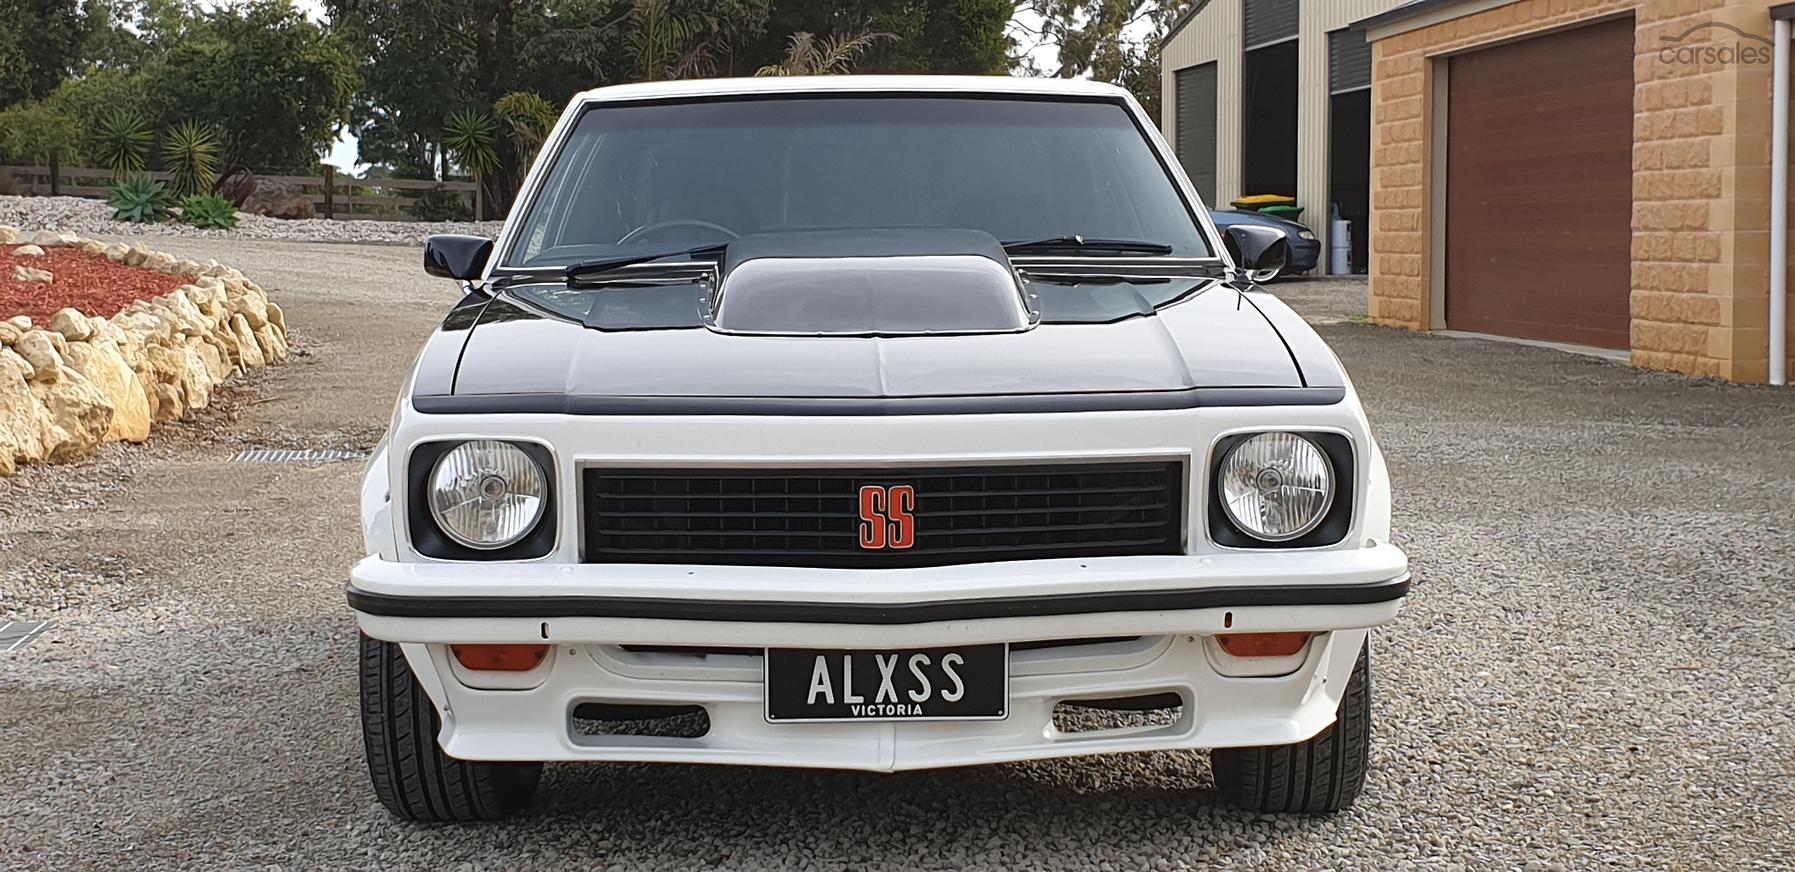 1977 Holden Torana SS LX Manual-SSE-AD-6131542 - carsales com au